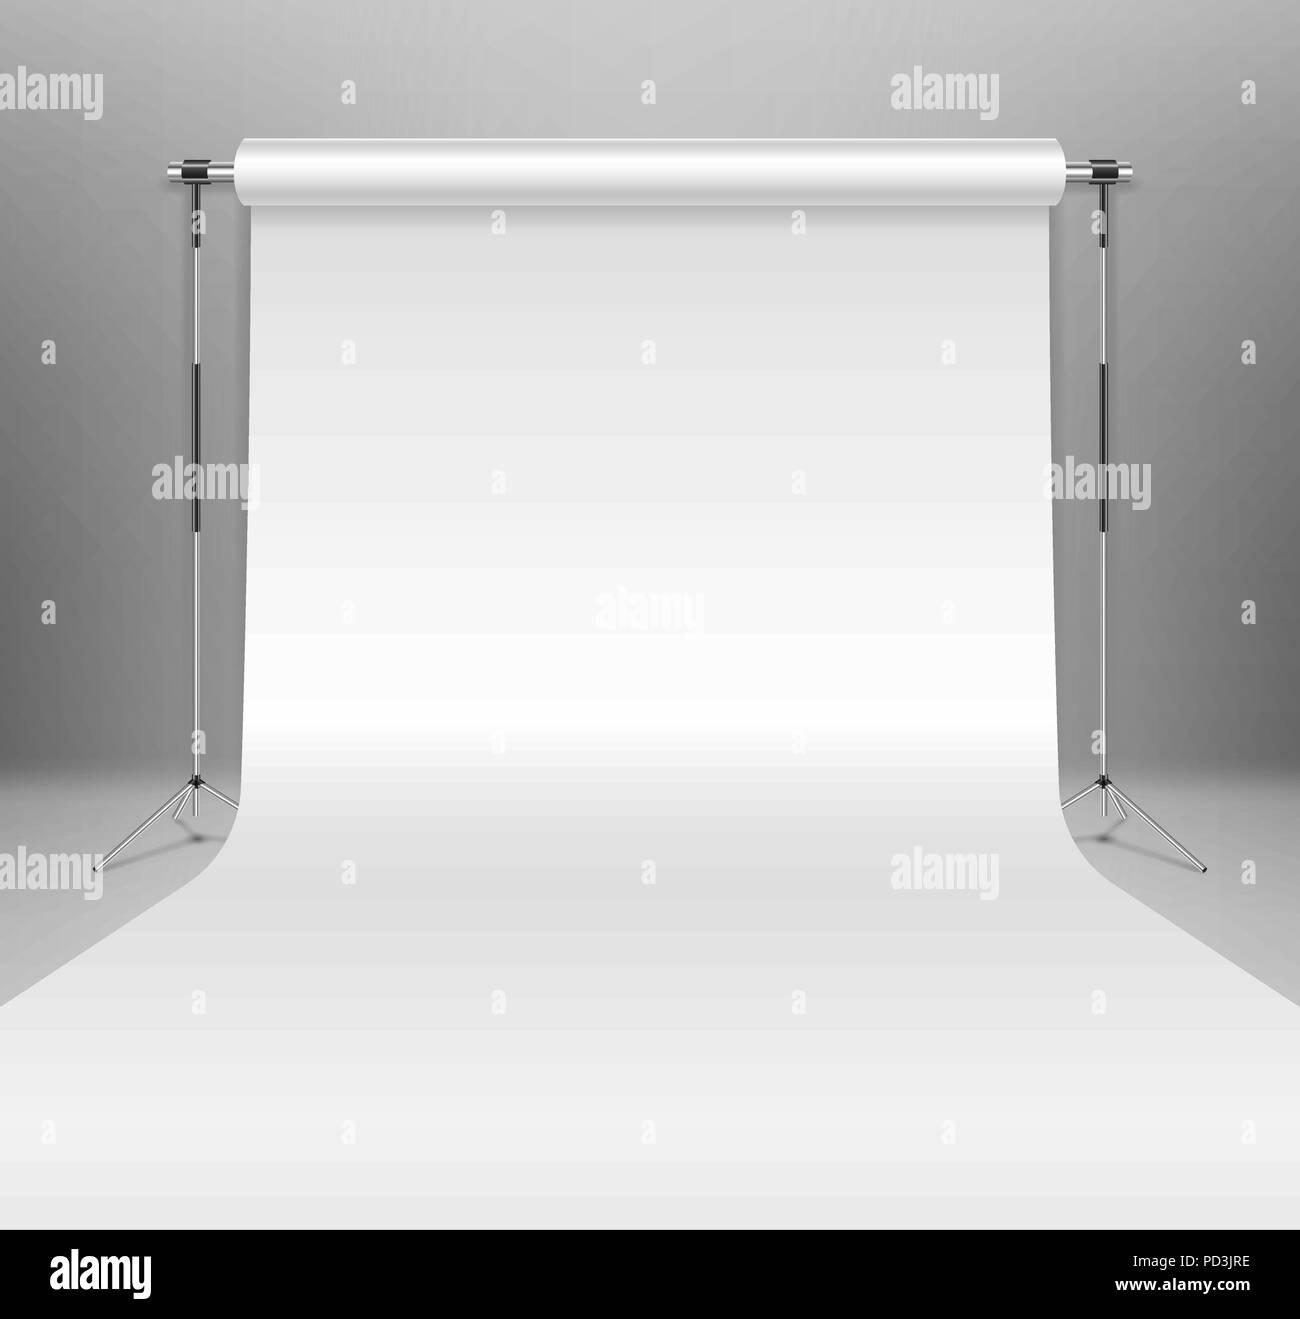 Realistic empty white photo studio backdrop template. photographer studio backdrop stand with white paper on Gray background. Vector illustration. - Stock Vector